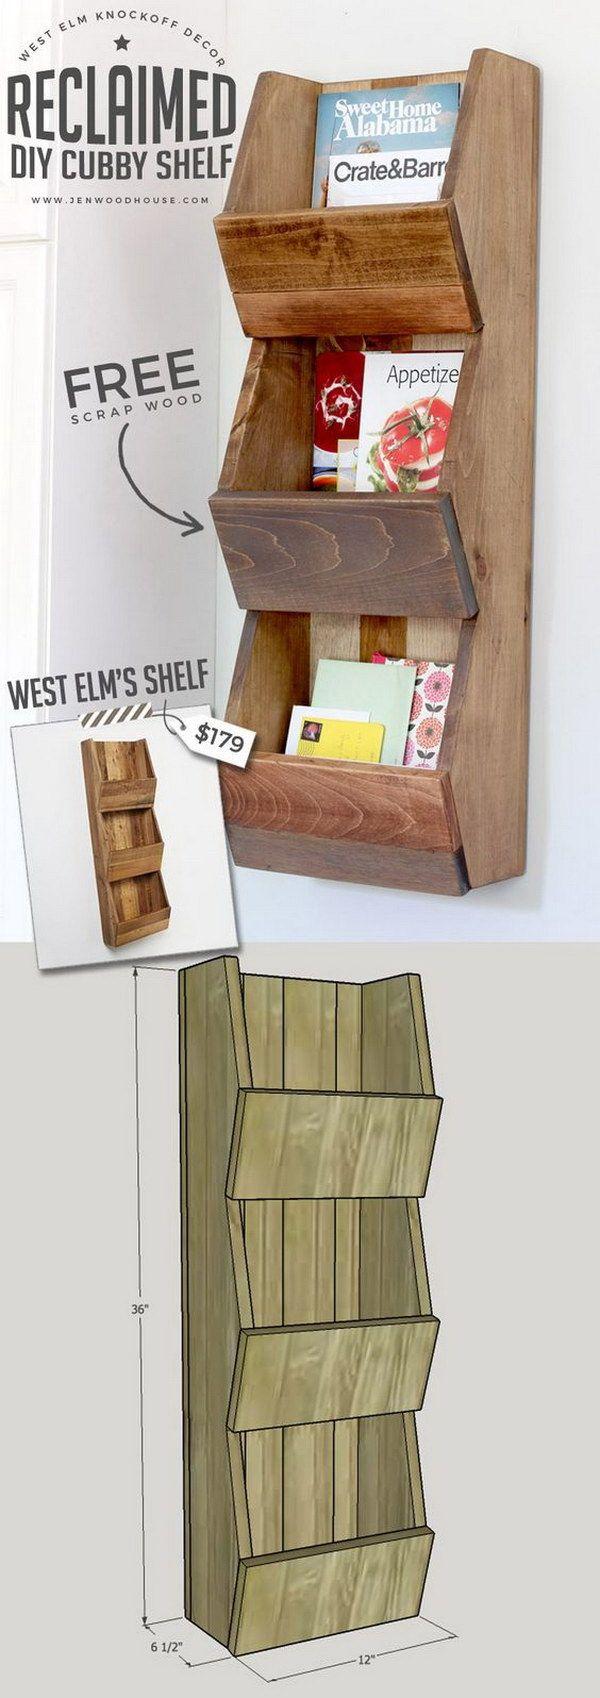 4.the cubby shelf